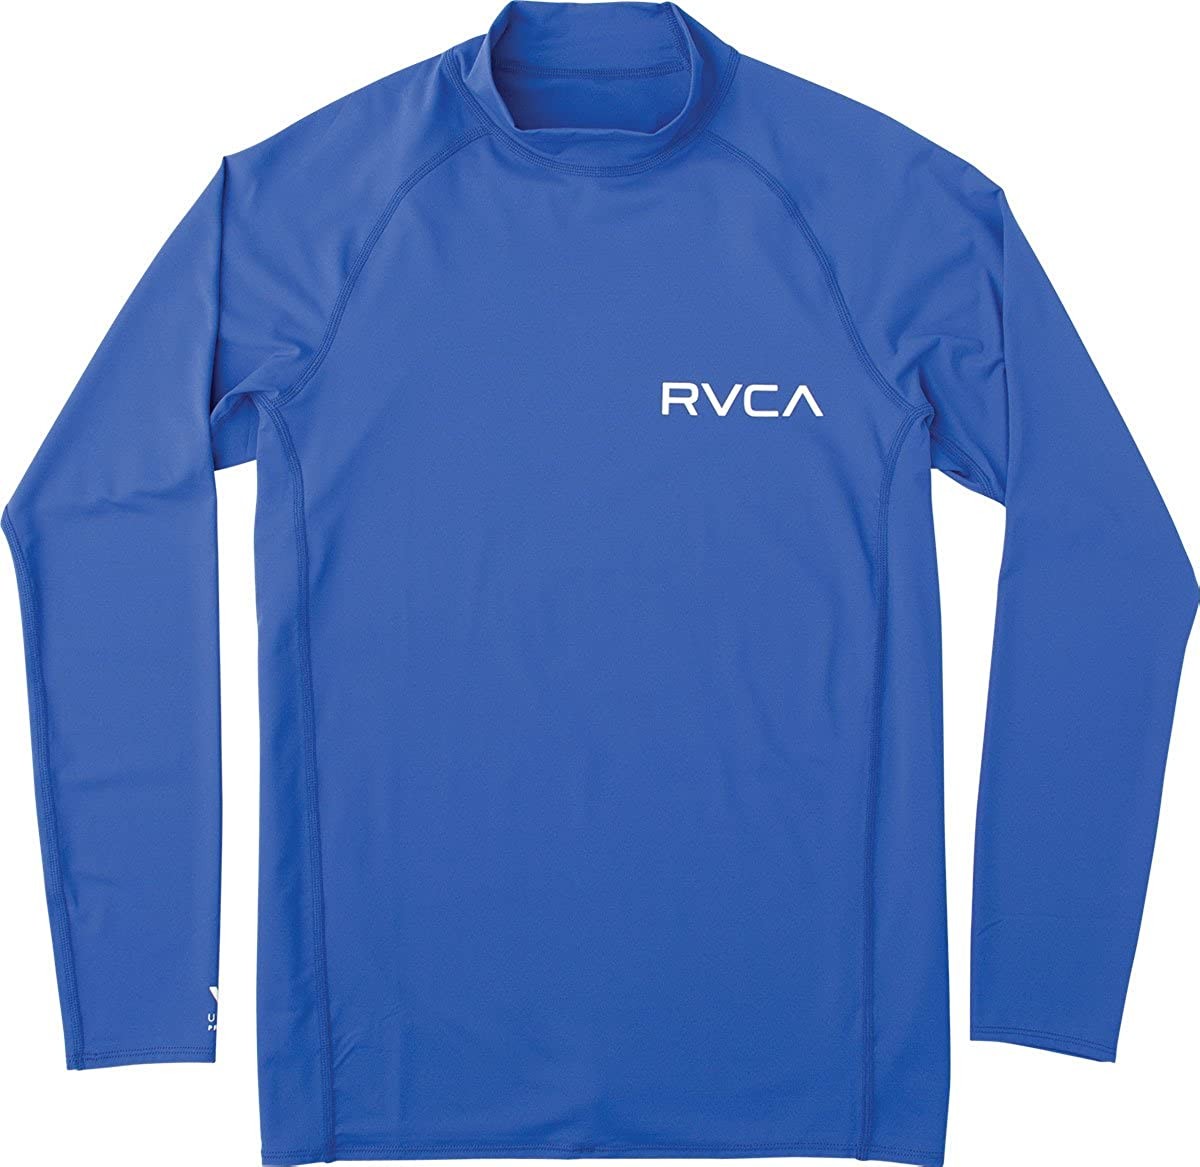 RVCA Boys Big Solid Long Sleeve Rashguard